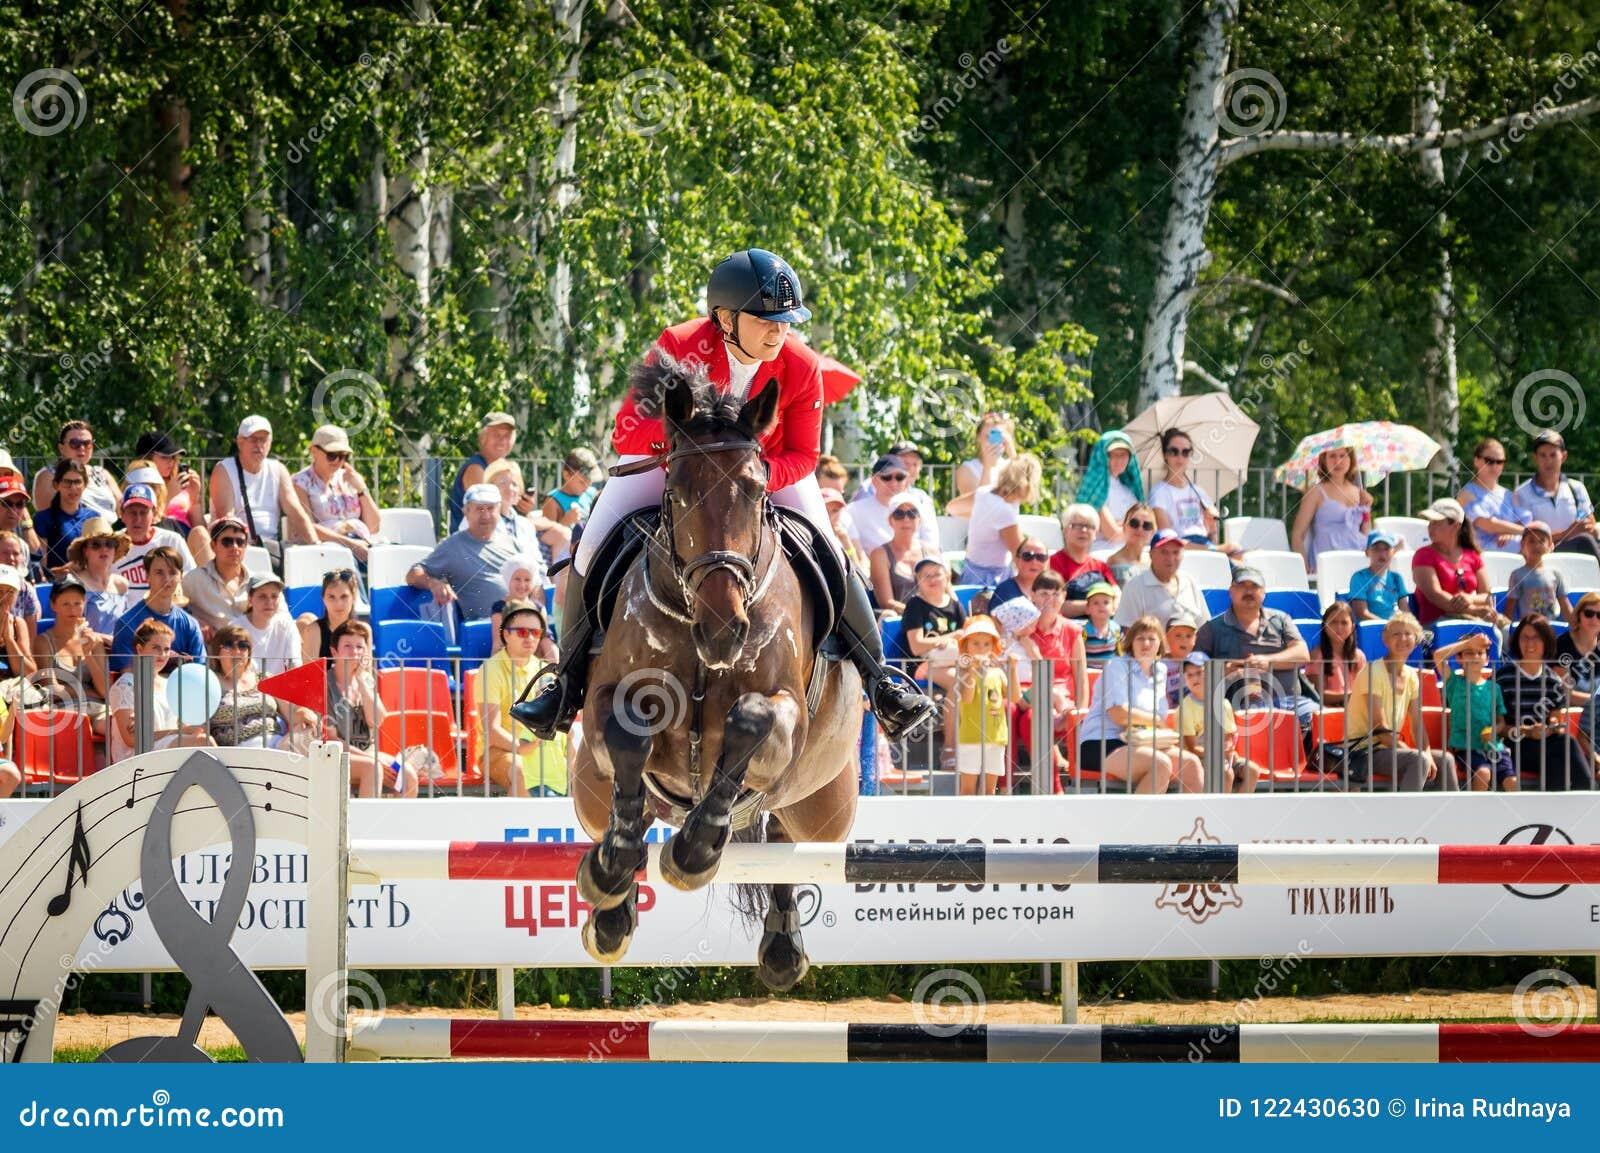 Competencias de salto del caballo internacional, Rusia, Ekaterinburg, 28 07 2018